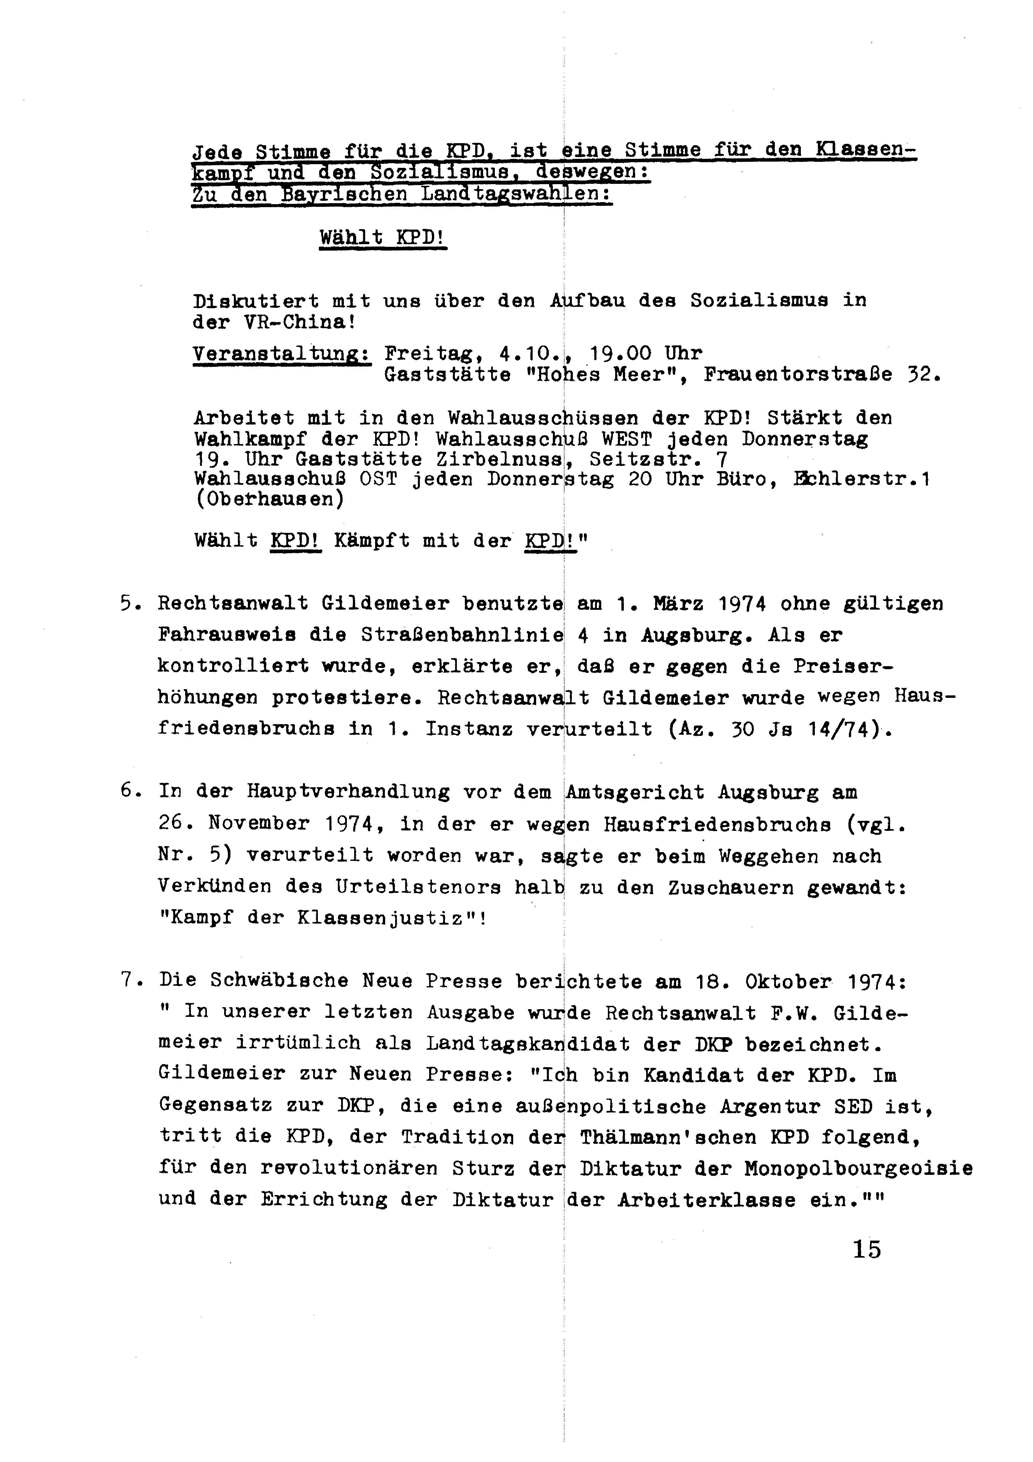 RHeV_Anschuldigung_RA_Gildemeier_Seite_15